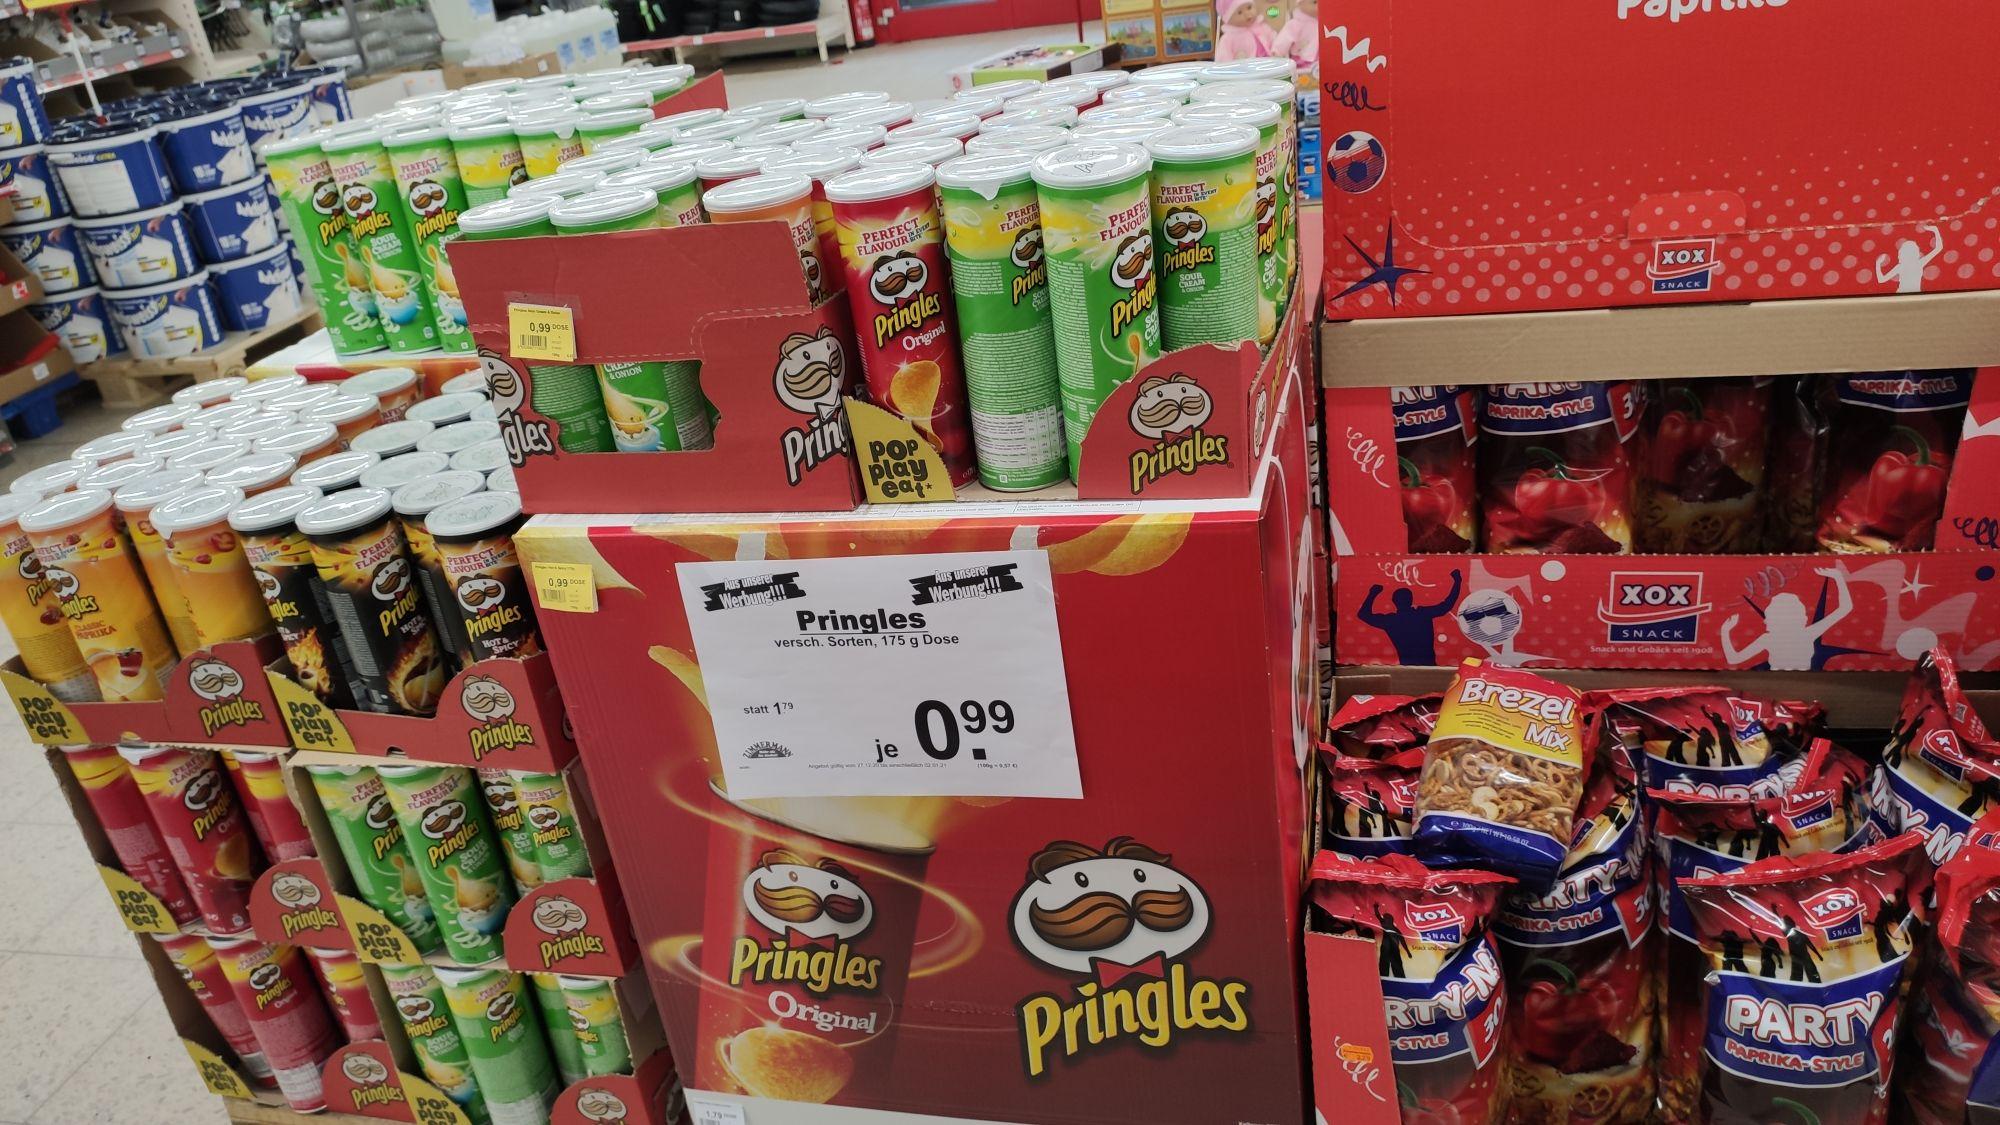 [Zimmermann - Hambühren / Lokal?] Pringles verschiedene Sorten